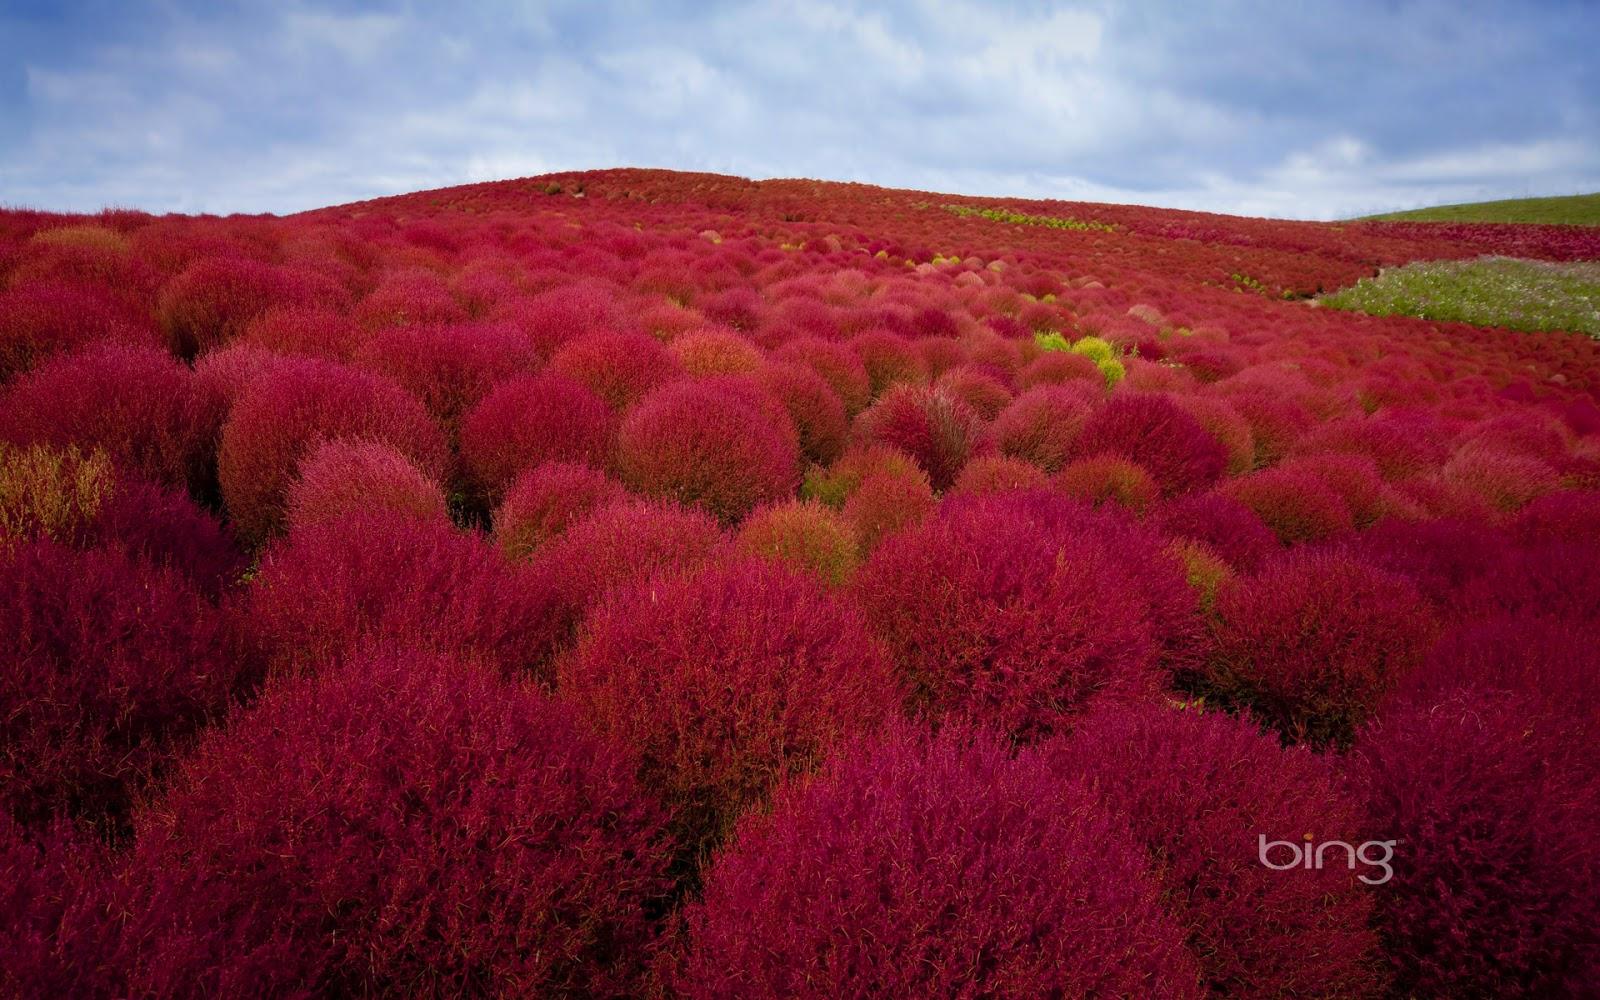 Burning bush plants in Hitachi Seaside Park, Hitachinaka City, Japan ...